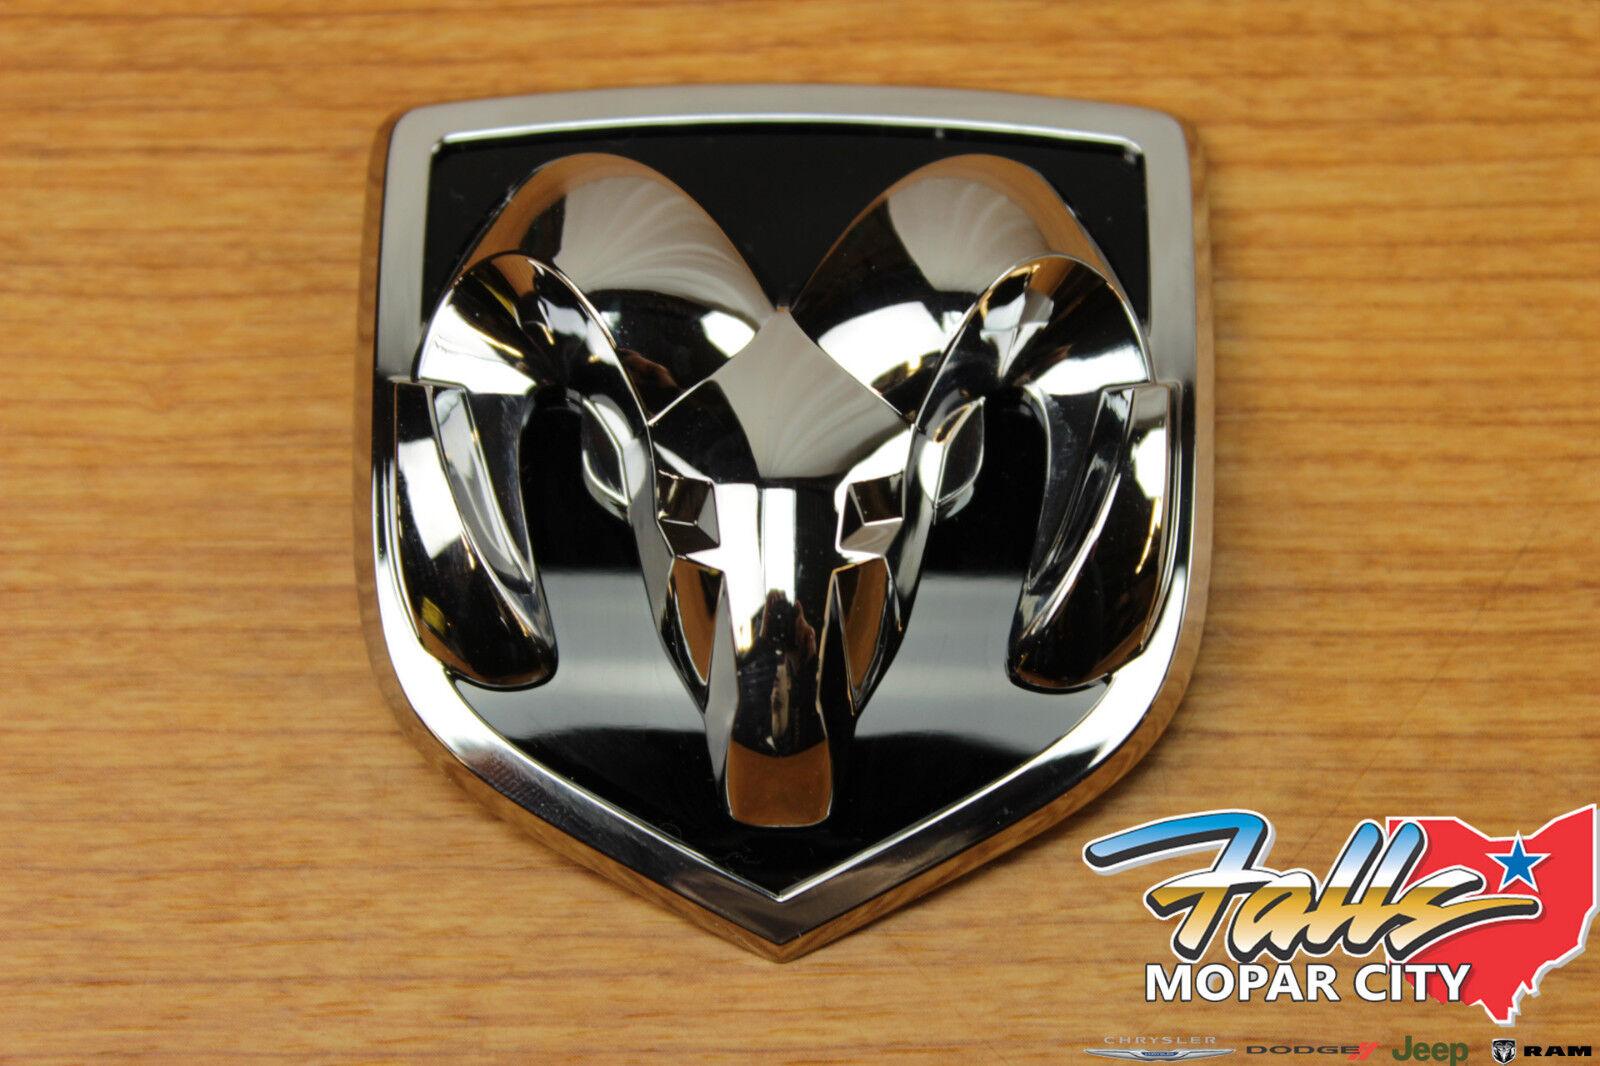 2002 2005 Dodge Ram 1500 2500 3500 Ram S Head Grille Emblem Badge Mopar Oem Ebay